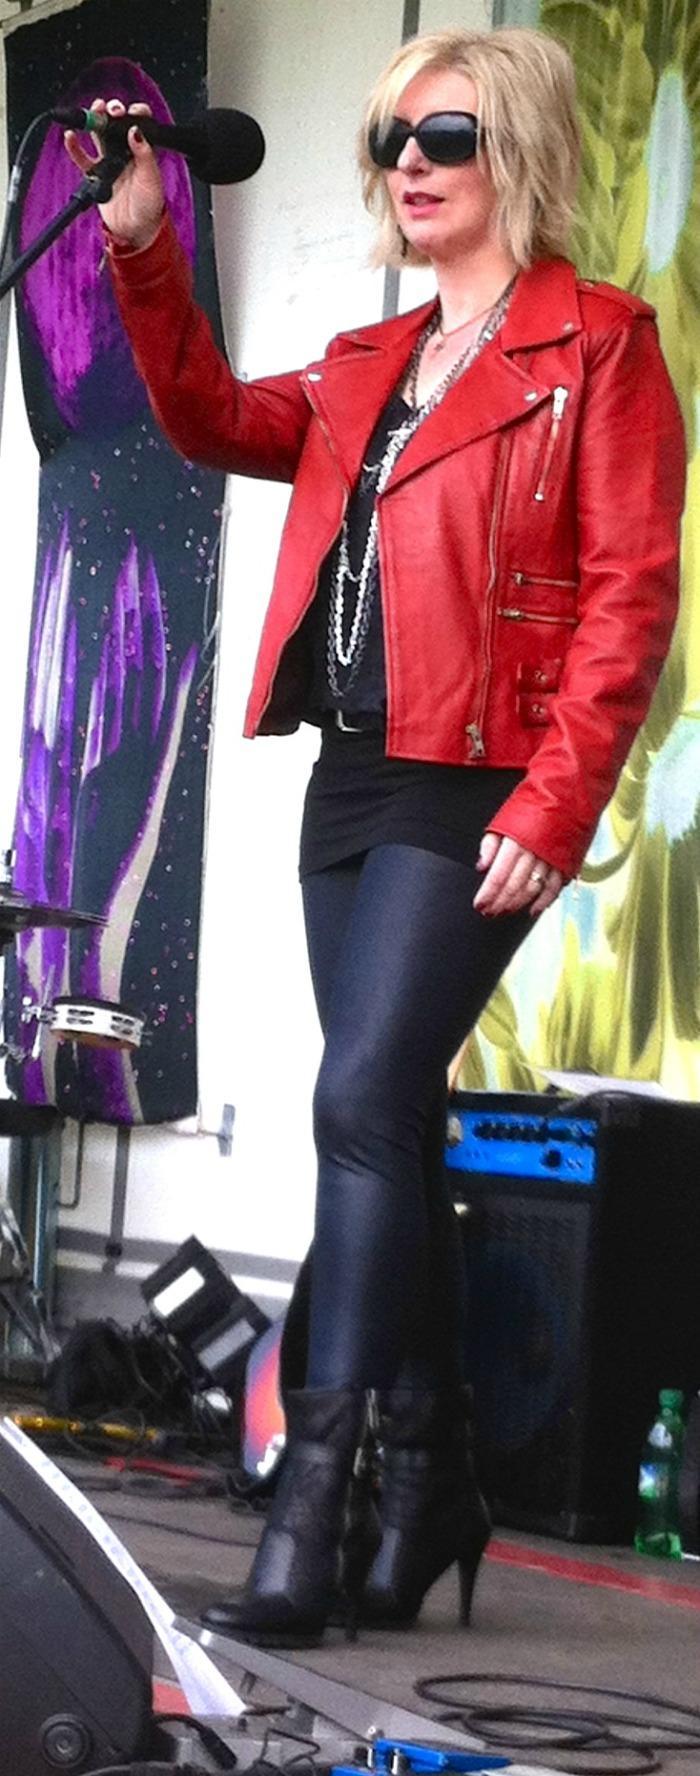 7. Ingliston, 2014, Great Scottish Bike Show